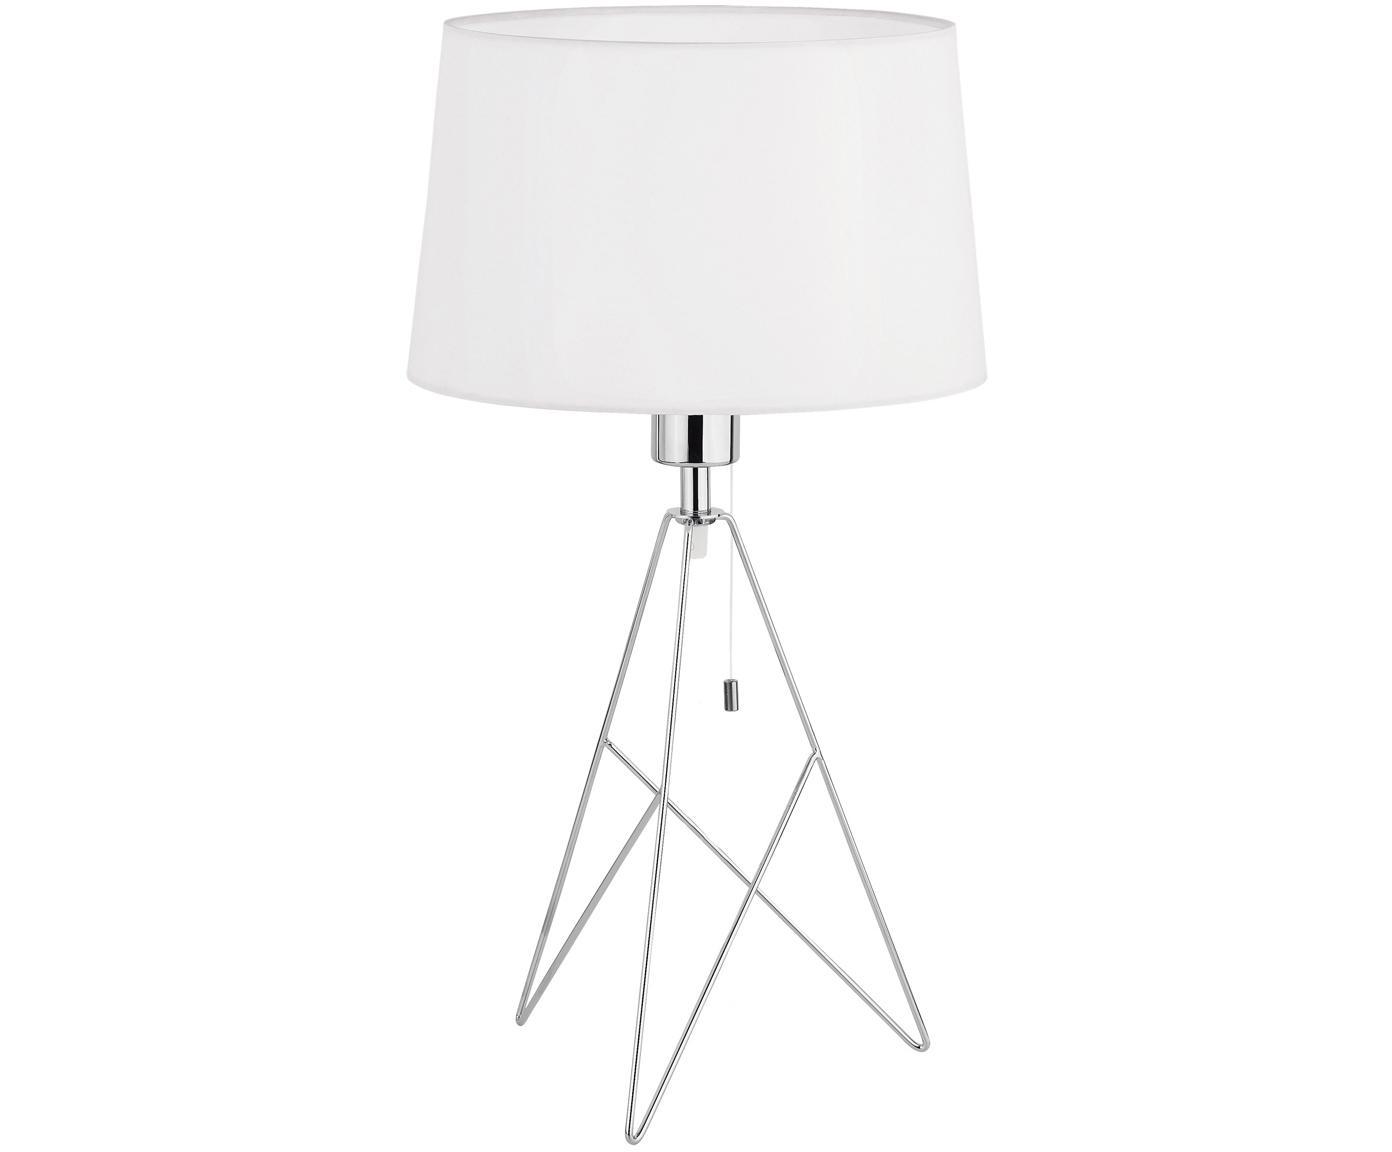 Tafellamp Camporale in zilverkleur, Lampvoet: verchroomd staal, Wit, chroomkleurig, Ø 30 x H 56 cm